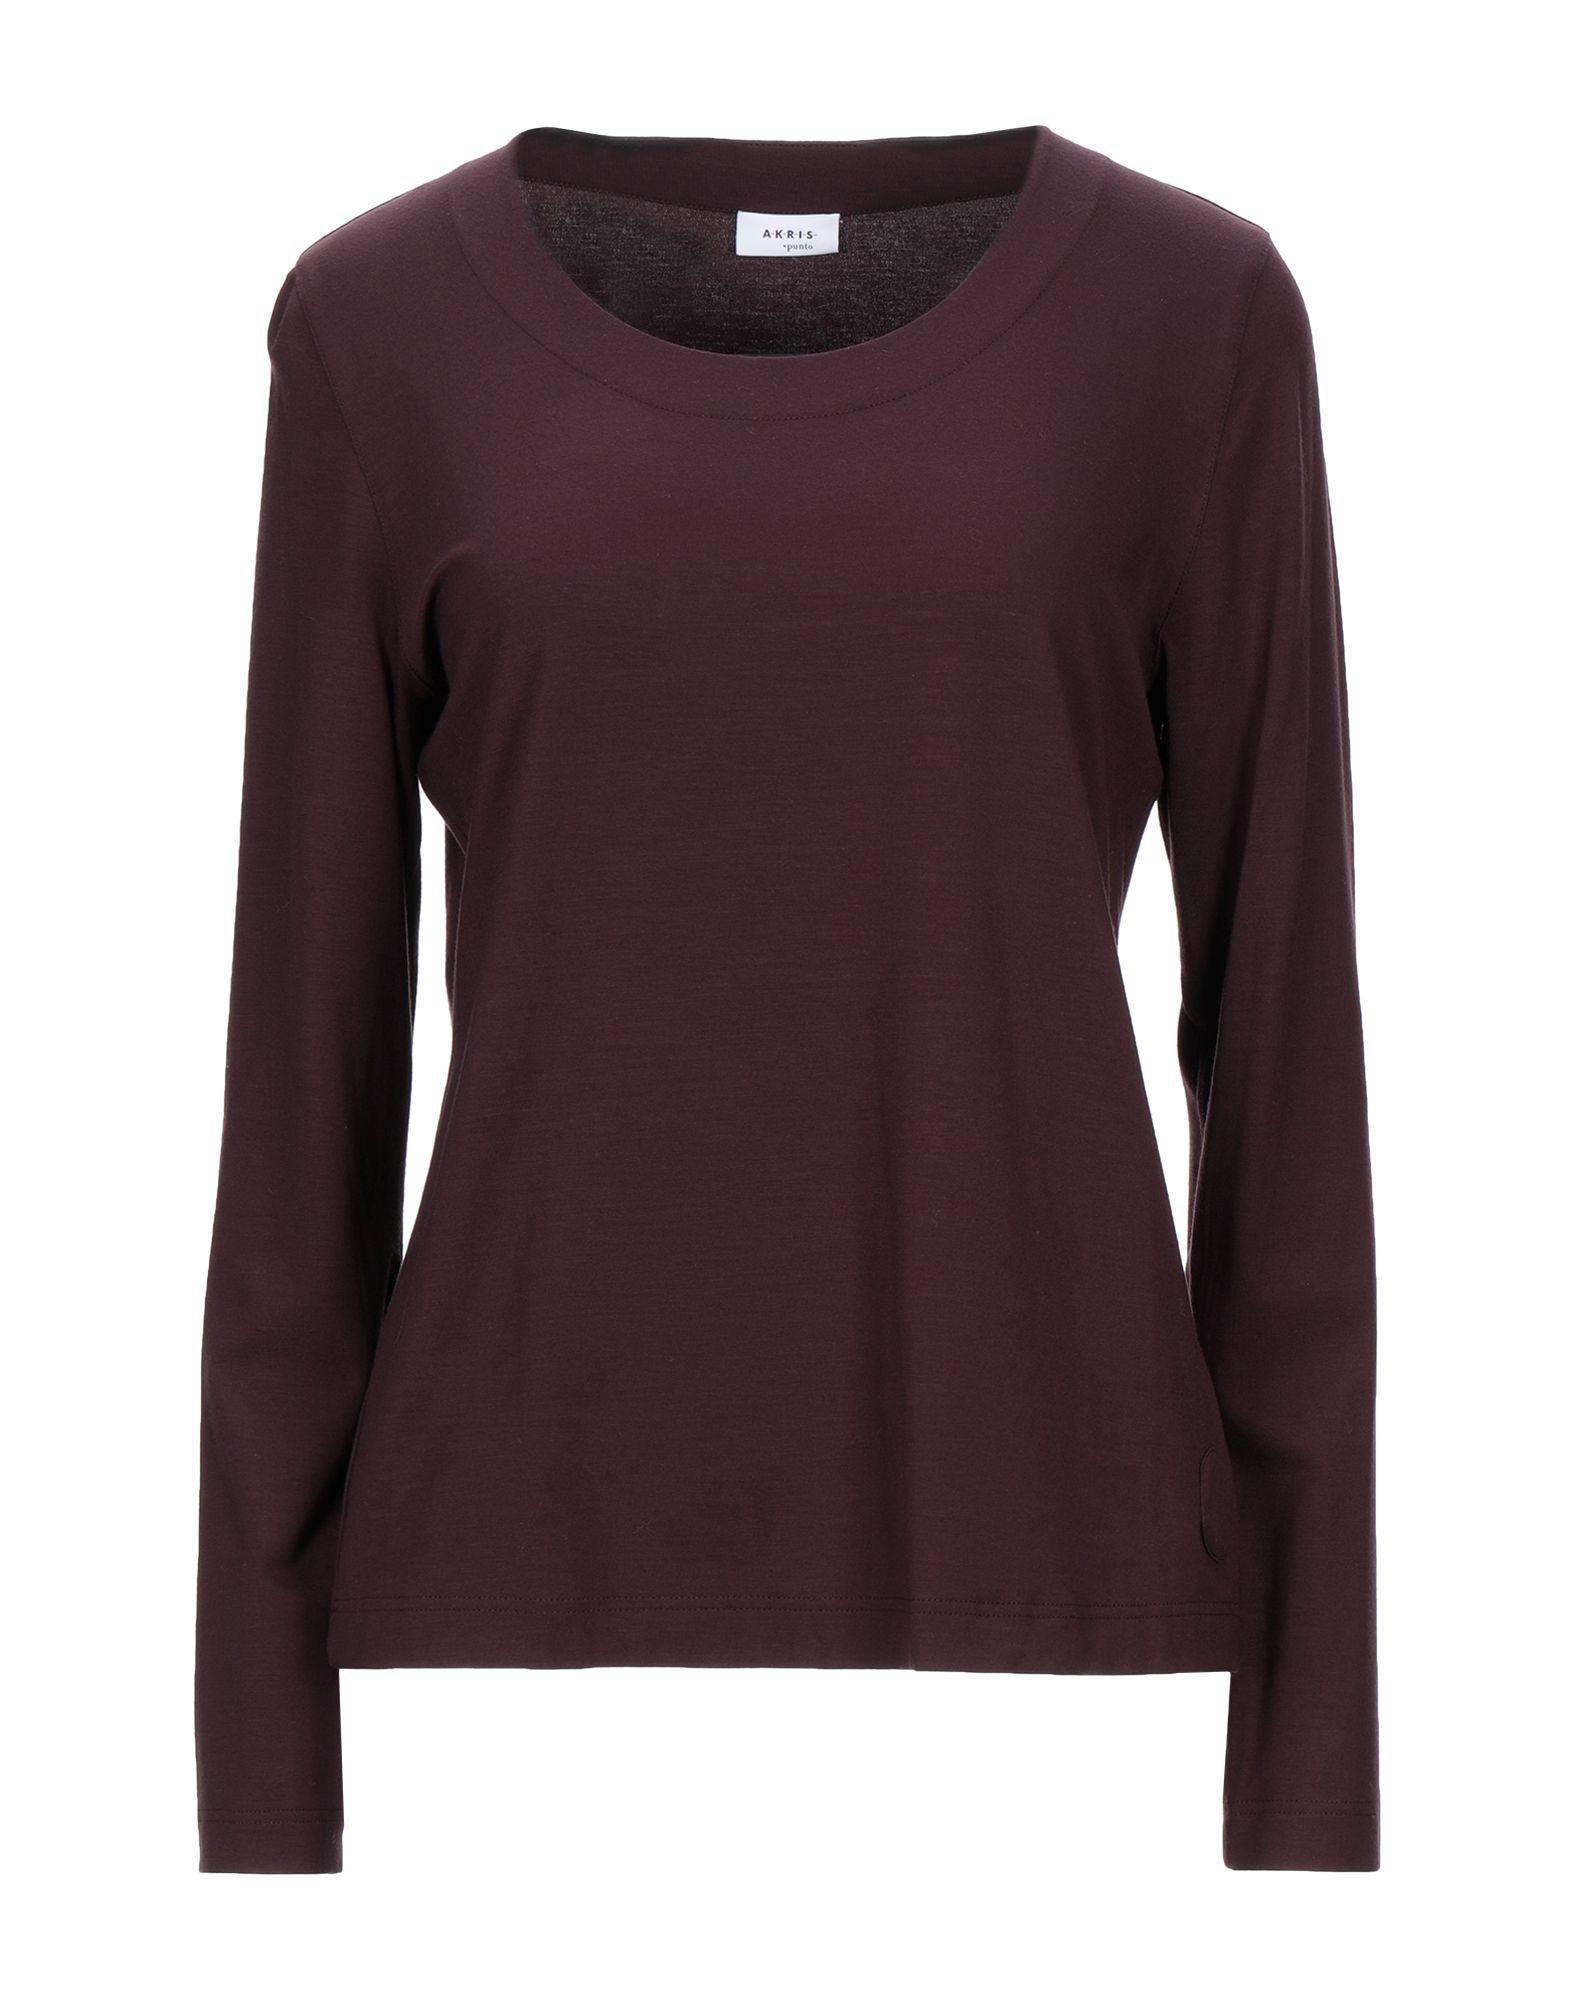 AKRIS PUNTO T-shirts. jersey, no appliqués, basic solid color, round collar, long sleeves, no pockets, stretch. 95% Modal, 5% Elastane